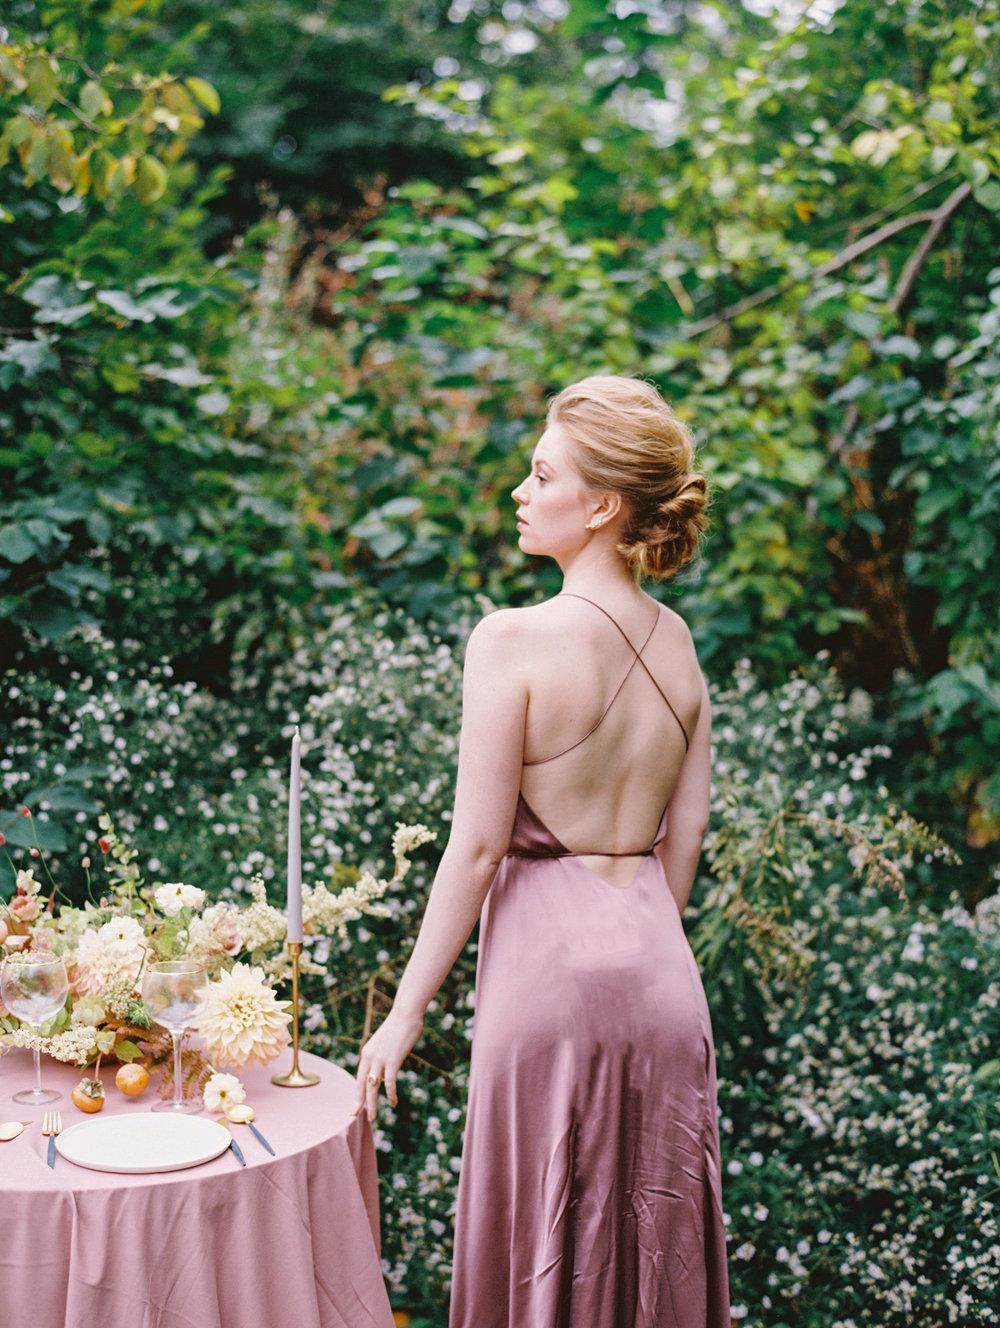 kelsandmichael_bridaleditorial_harvestelopement-124.jpg